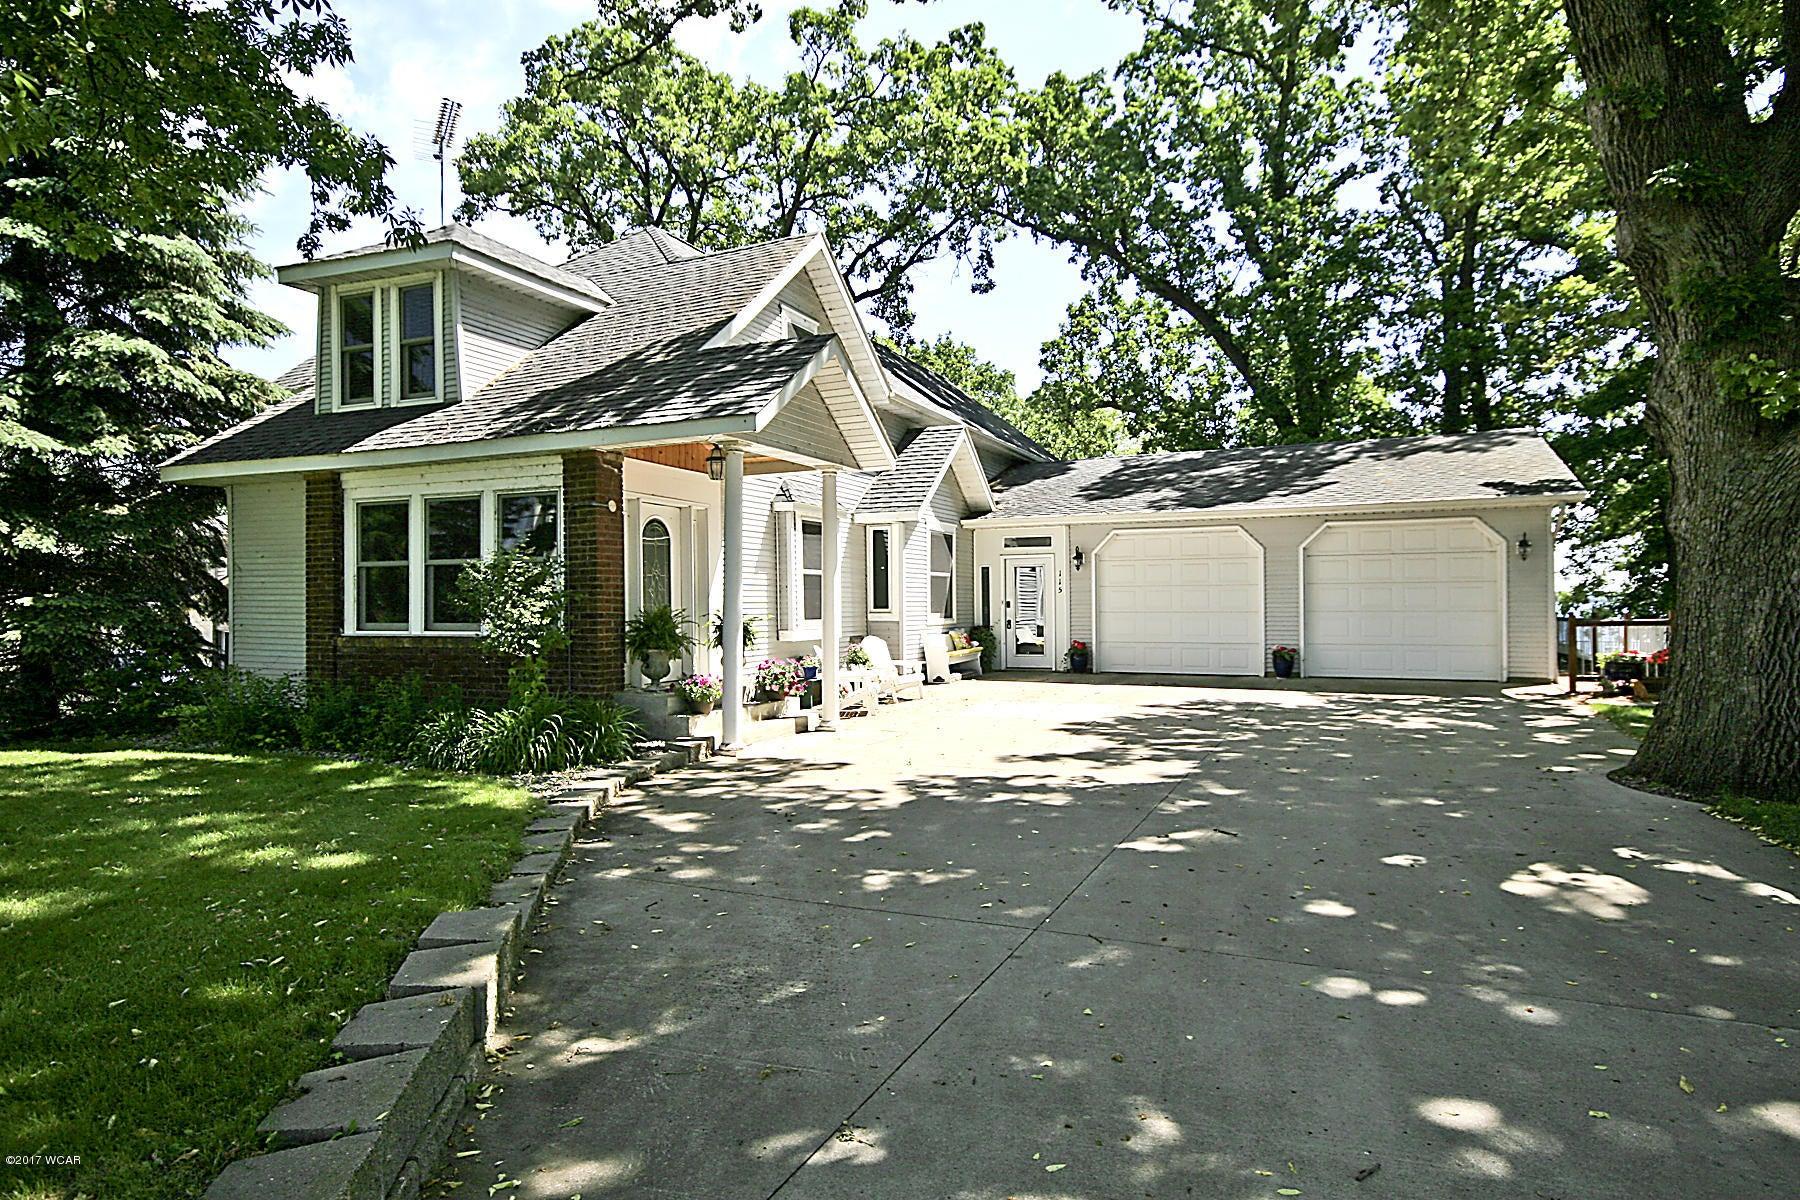 115 N Lake Avenue,Spicer,3 Bedrooms Bedrooms,3 BathroomsBathrooms,Single Family,N Lake Avenue,6026054